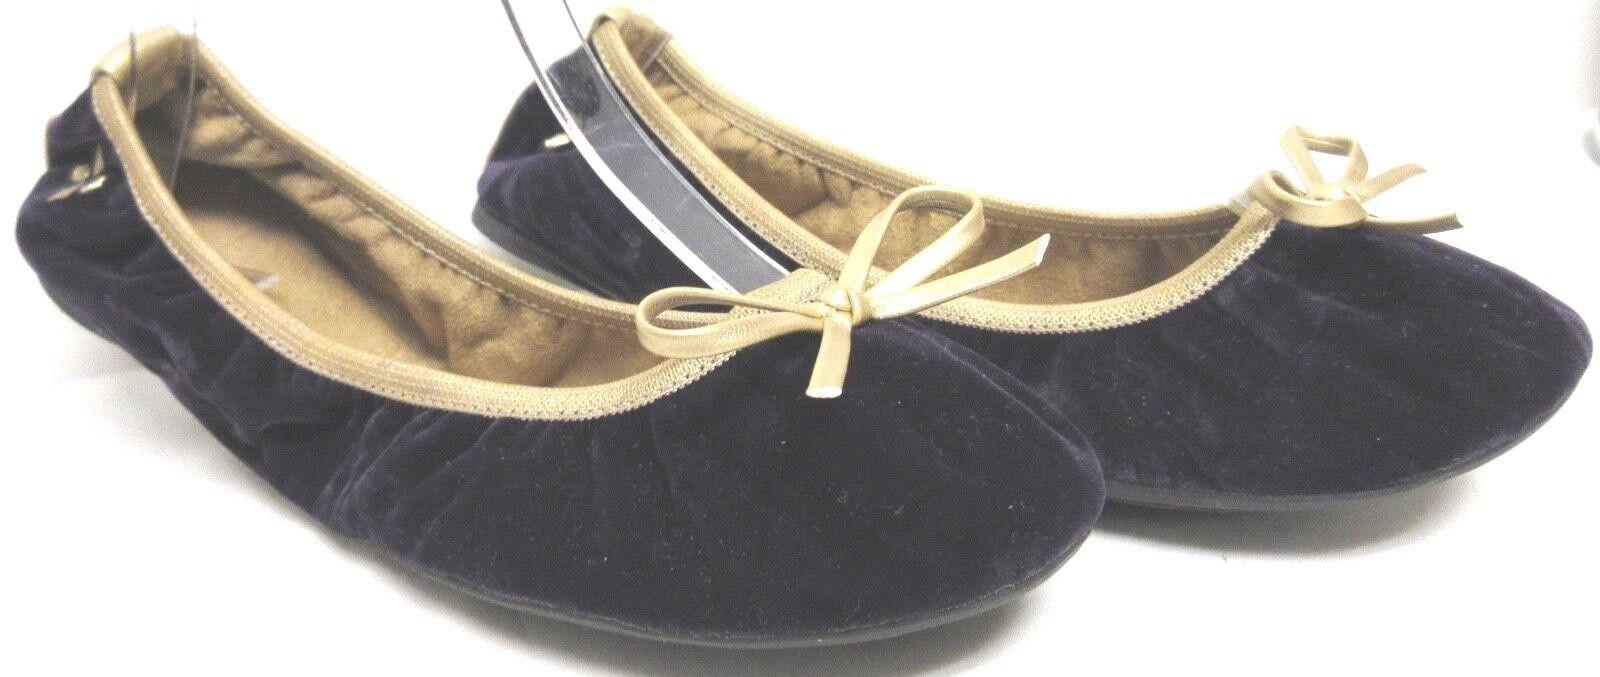 BUTTERFLY TWISTS AUBERGINE DEEP PURPLE VELVET PACKABLE BALLET FLATS W gold TRIM